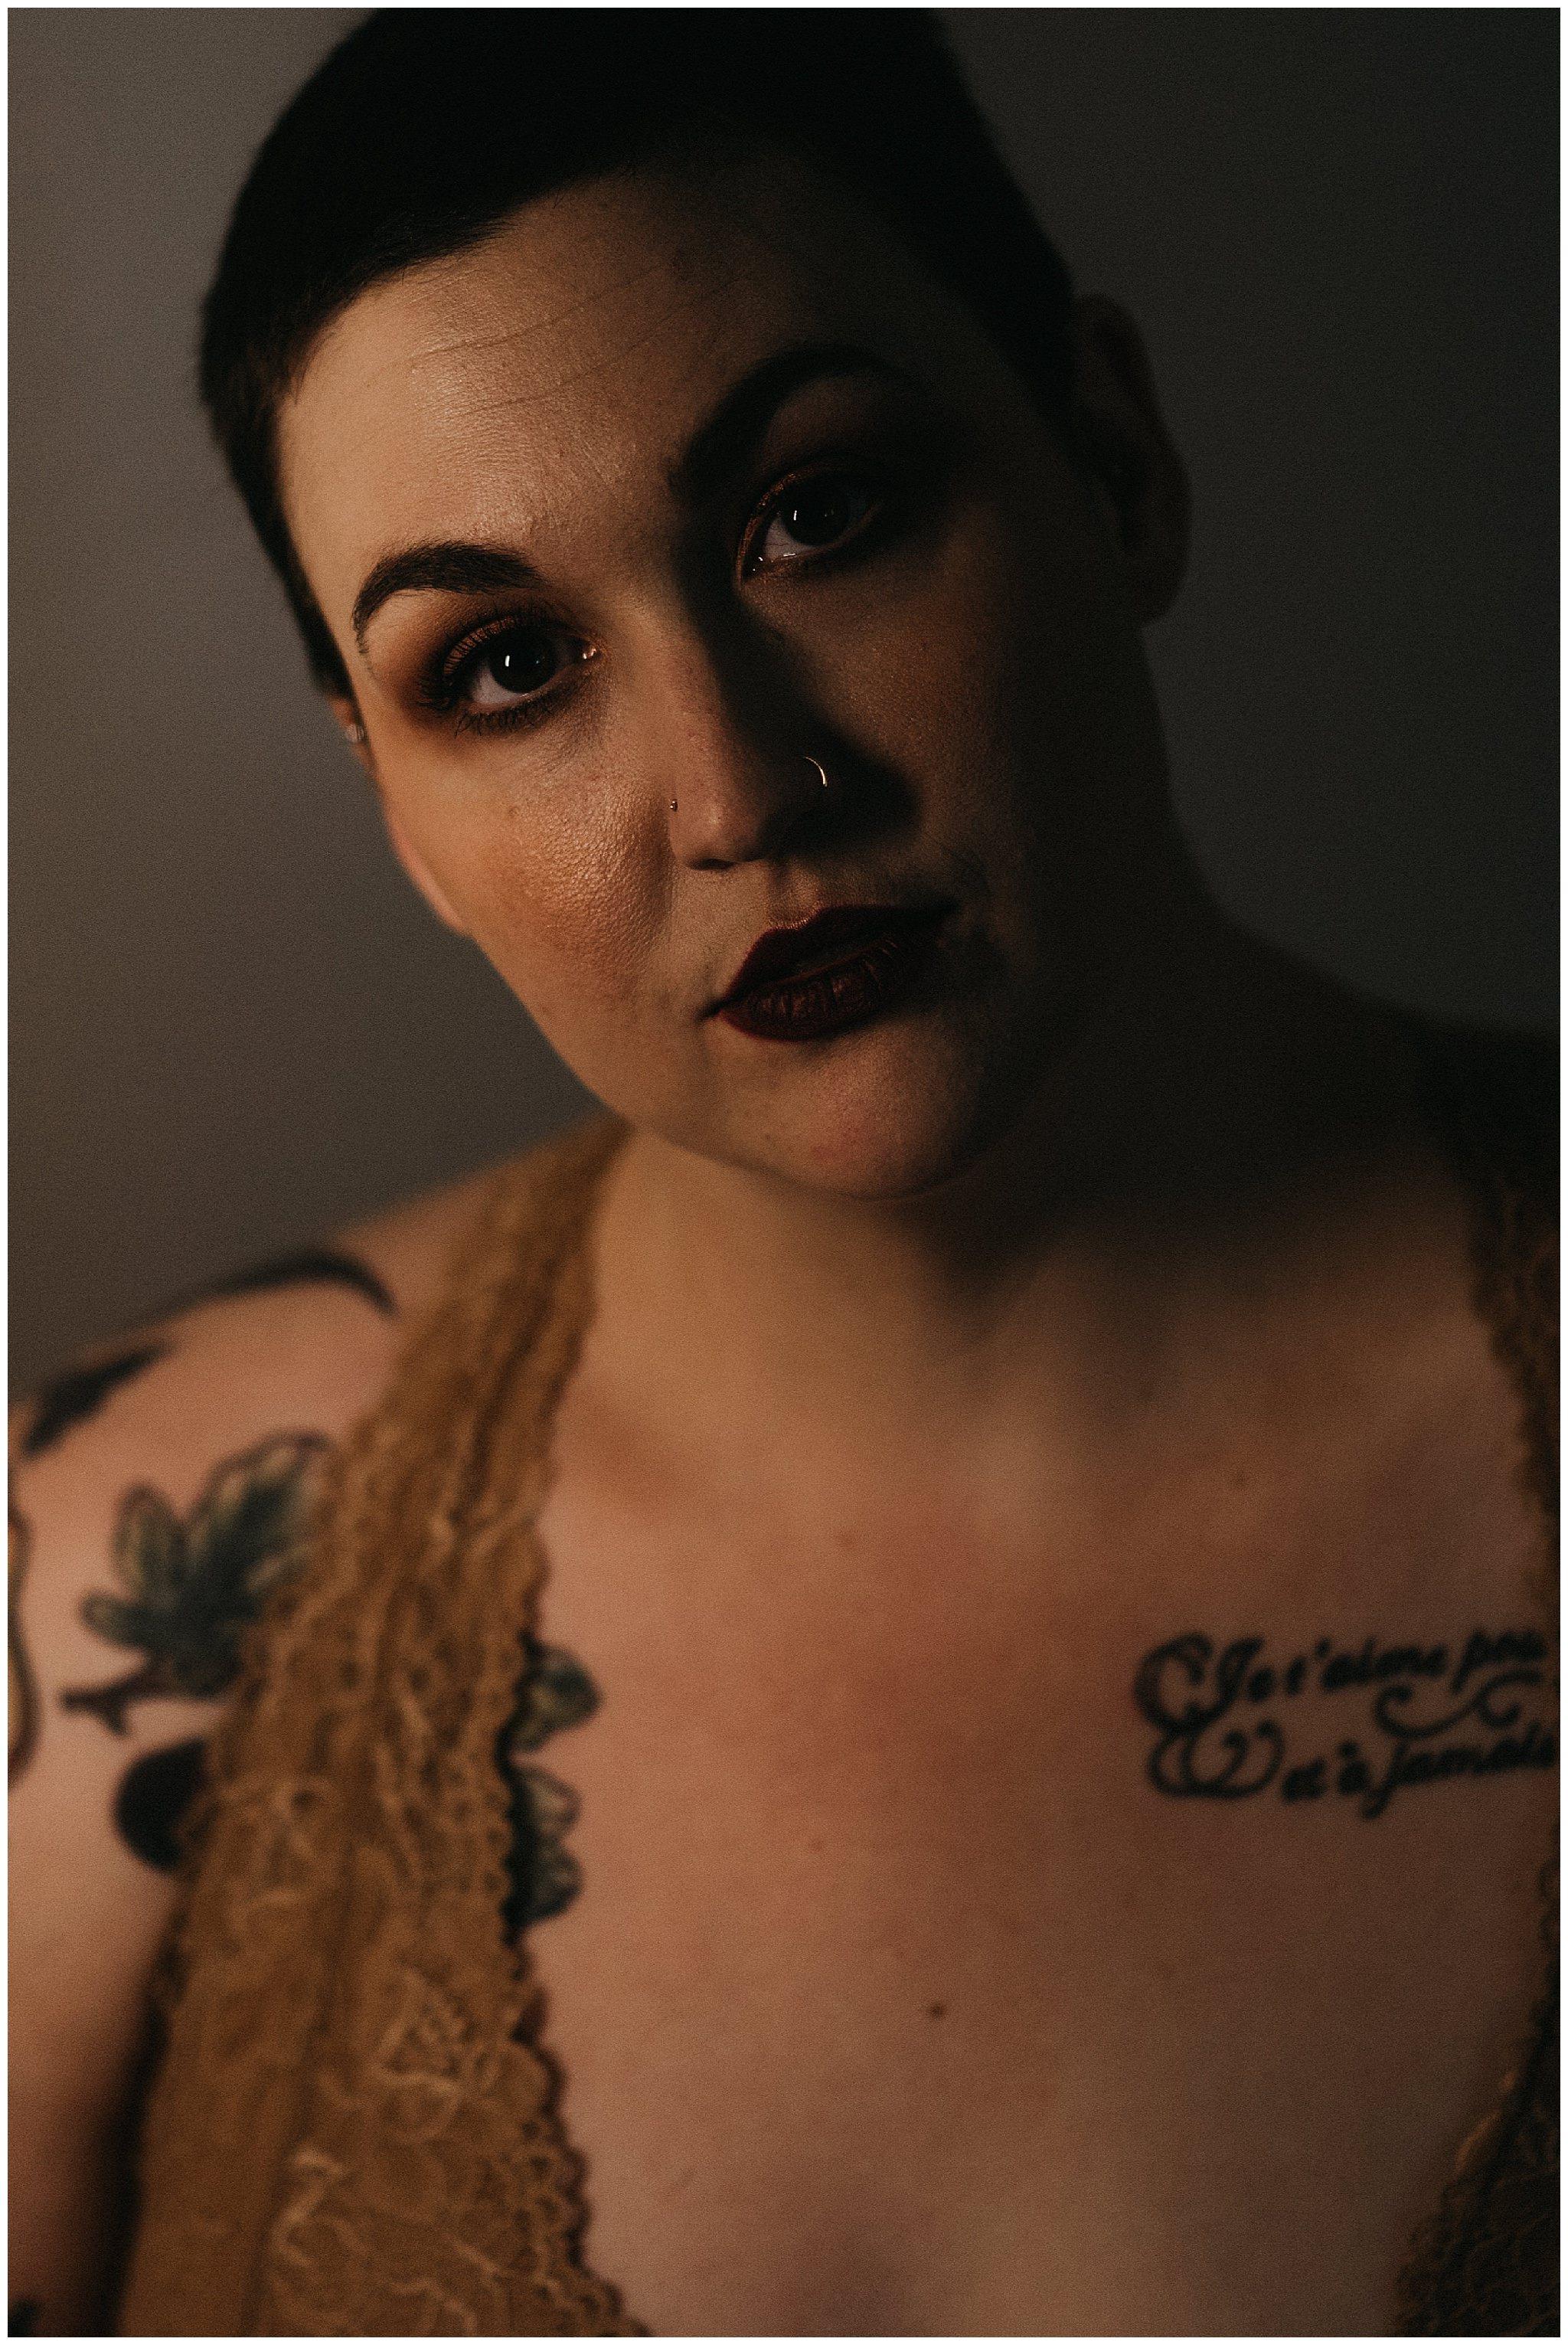 seatac-in-home-boudoir-portraits-kendall-fat-babe-boudoir22.jpg